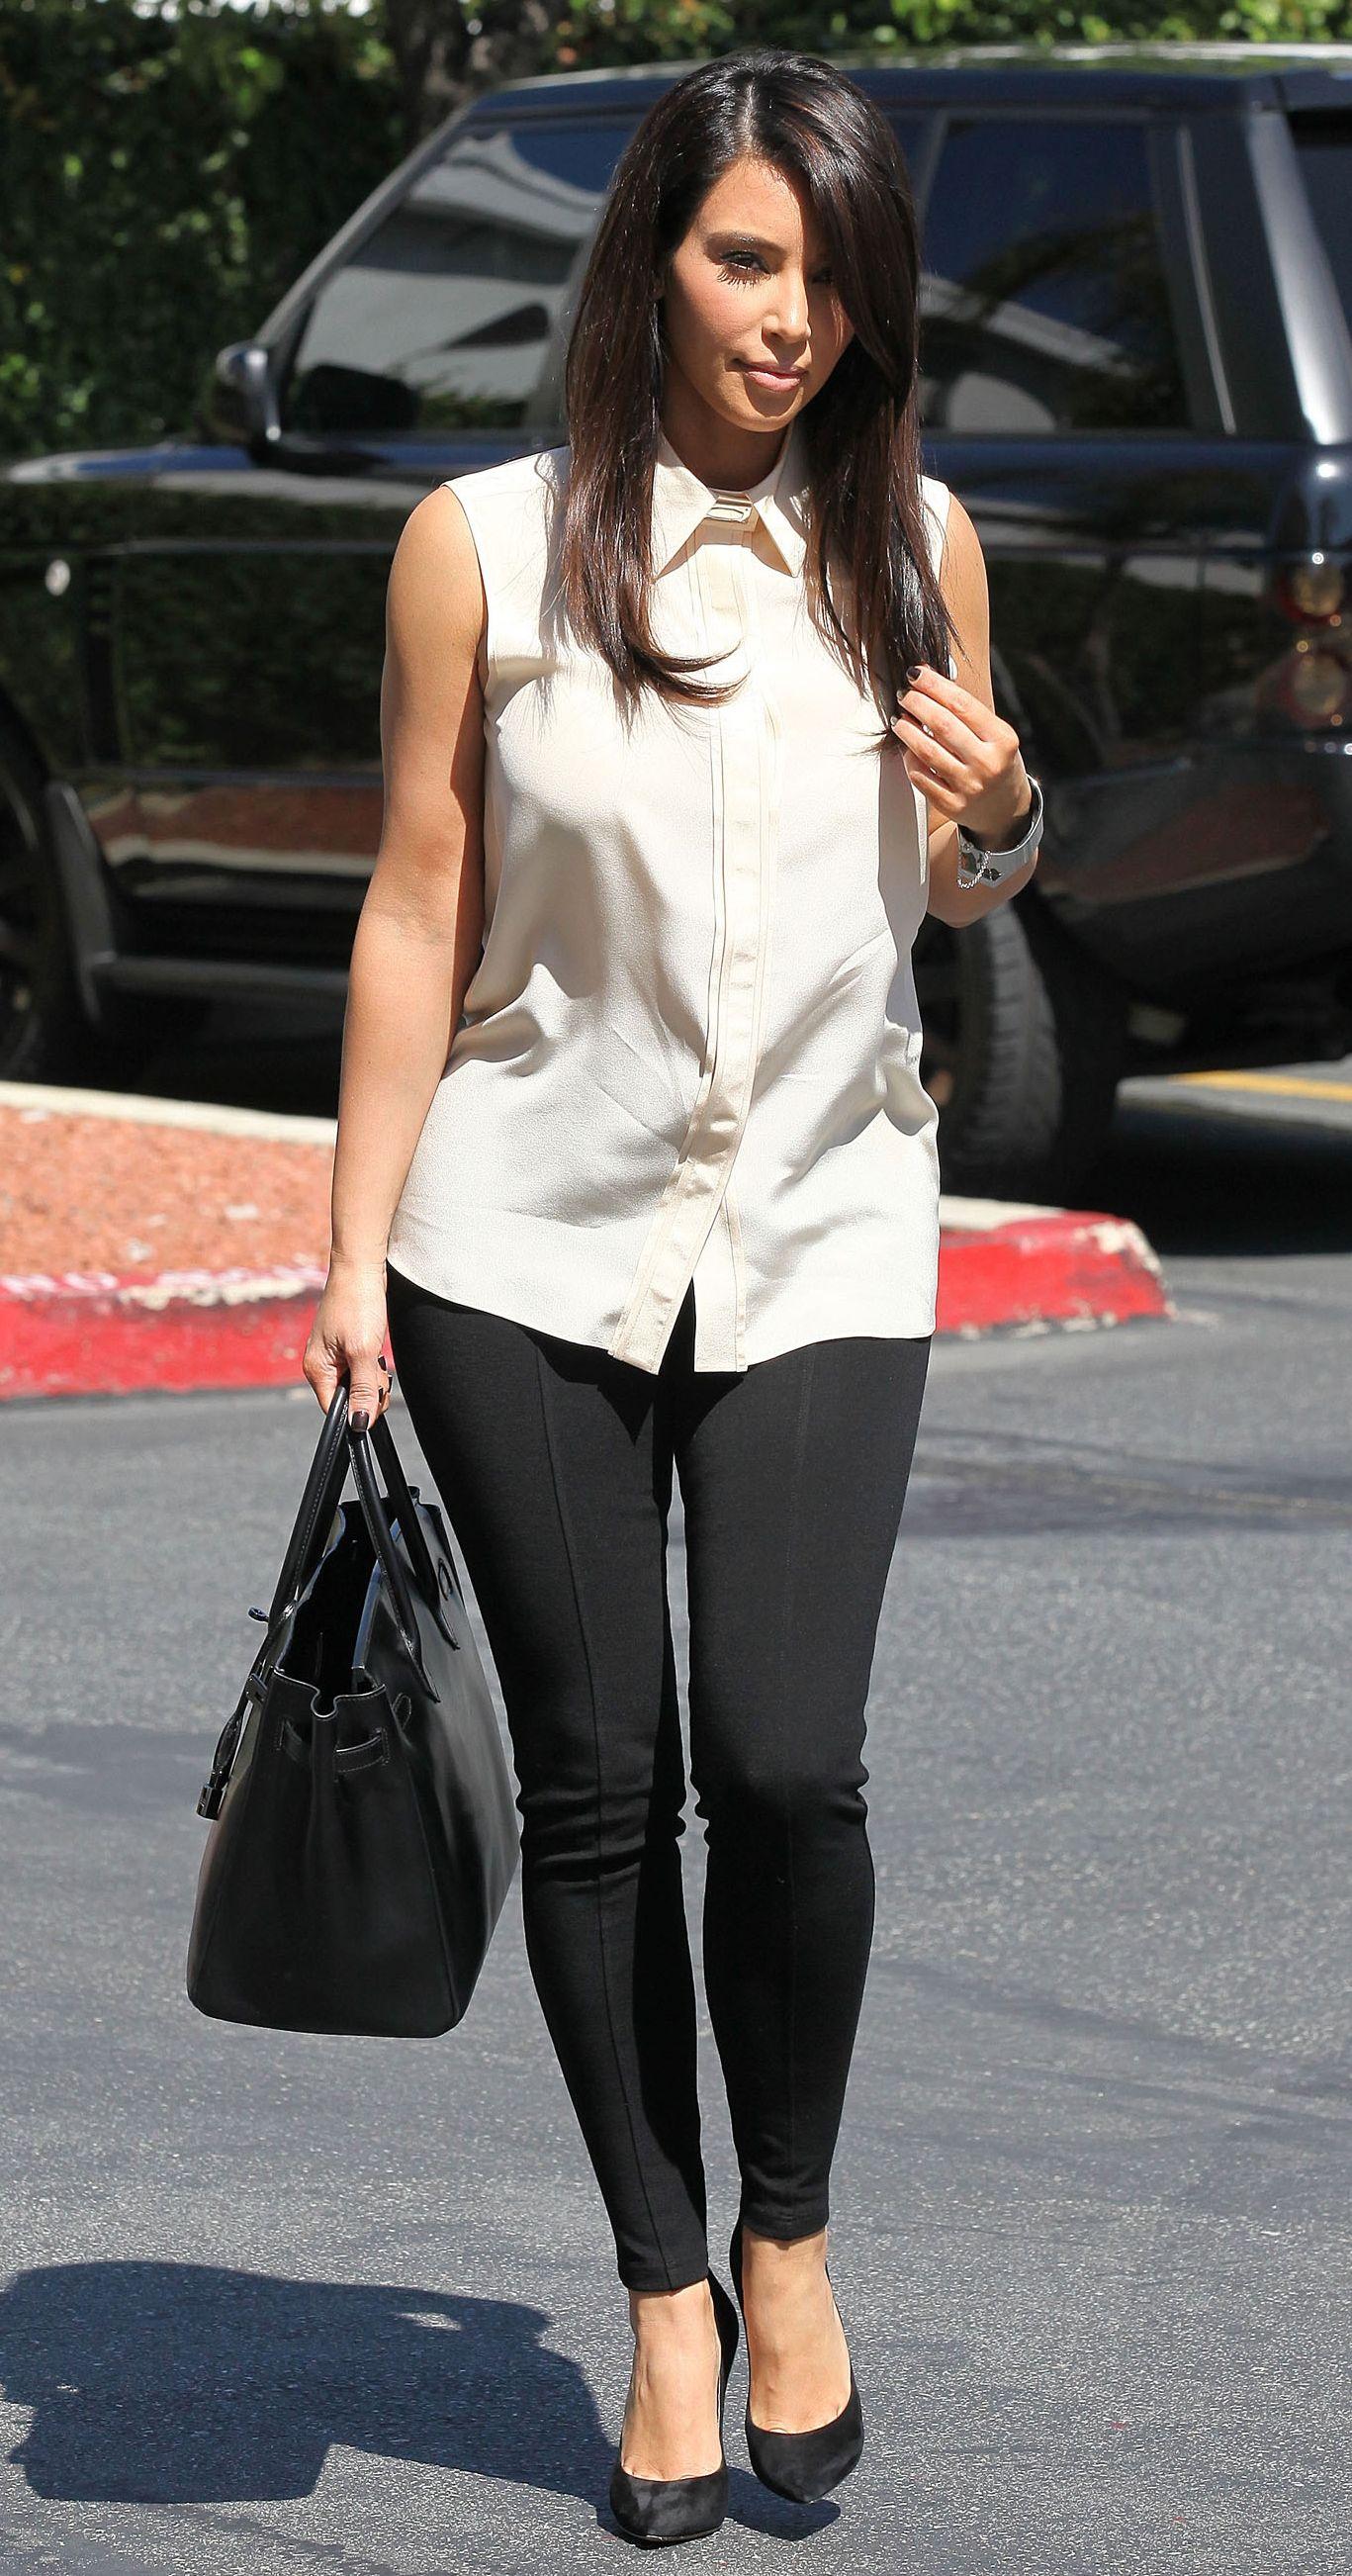 Medium length hair cut with bangs and dark brown color. Kim Kardashian ... 6f5809364c3d5